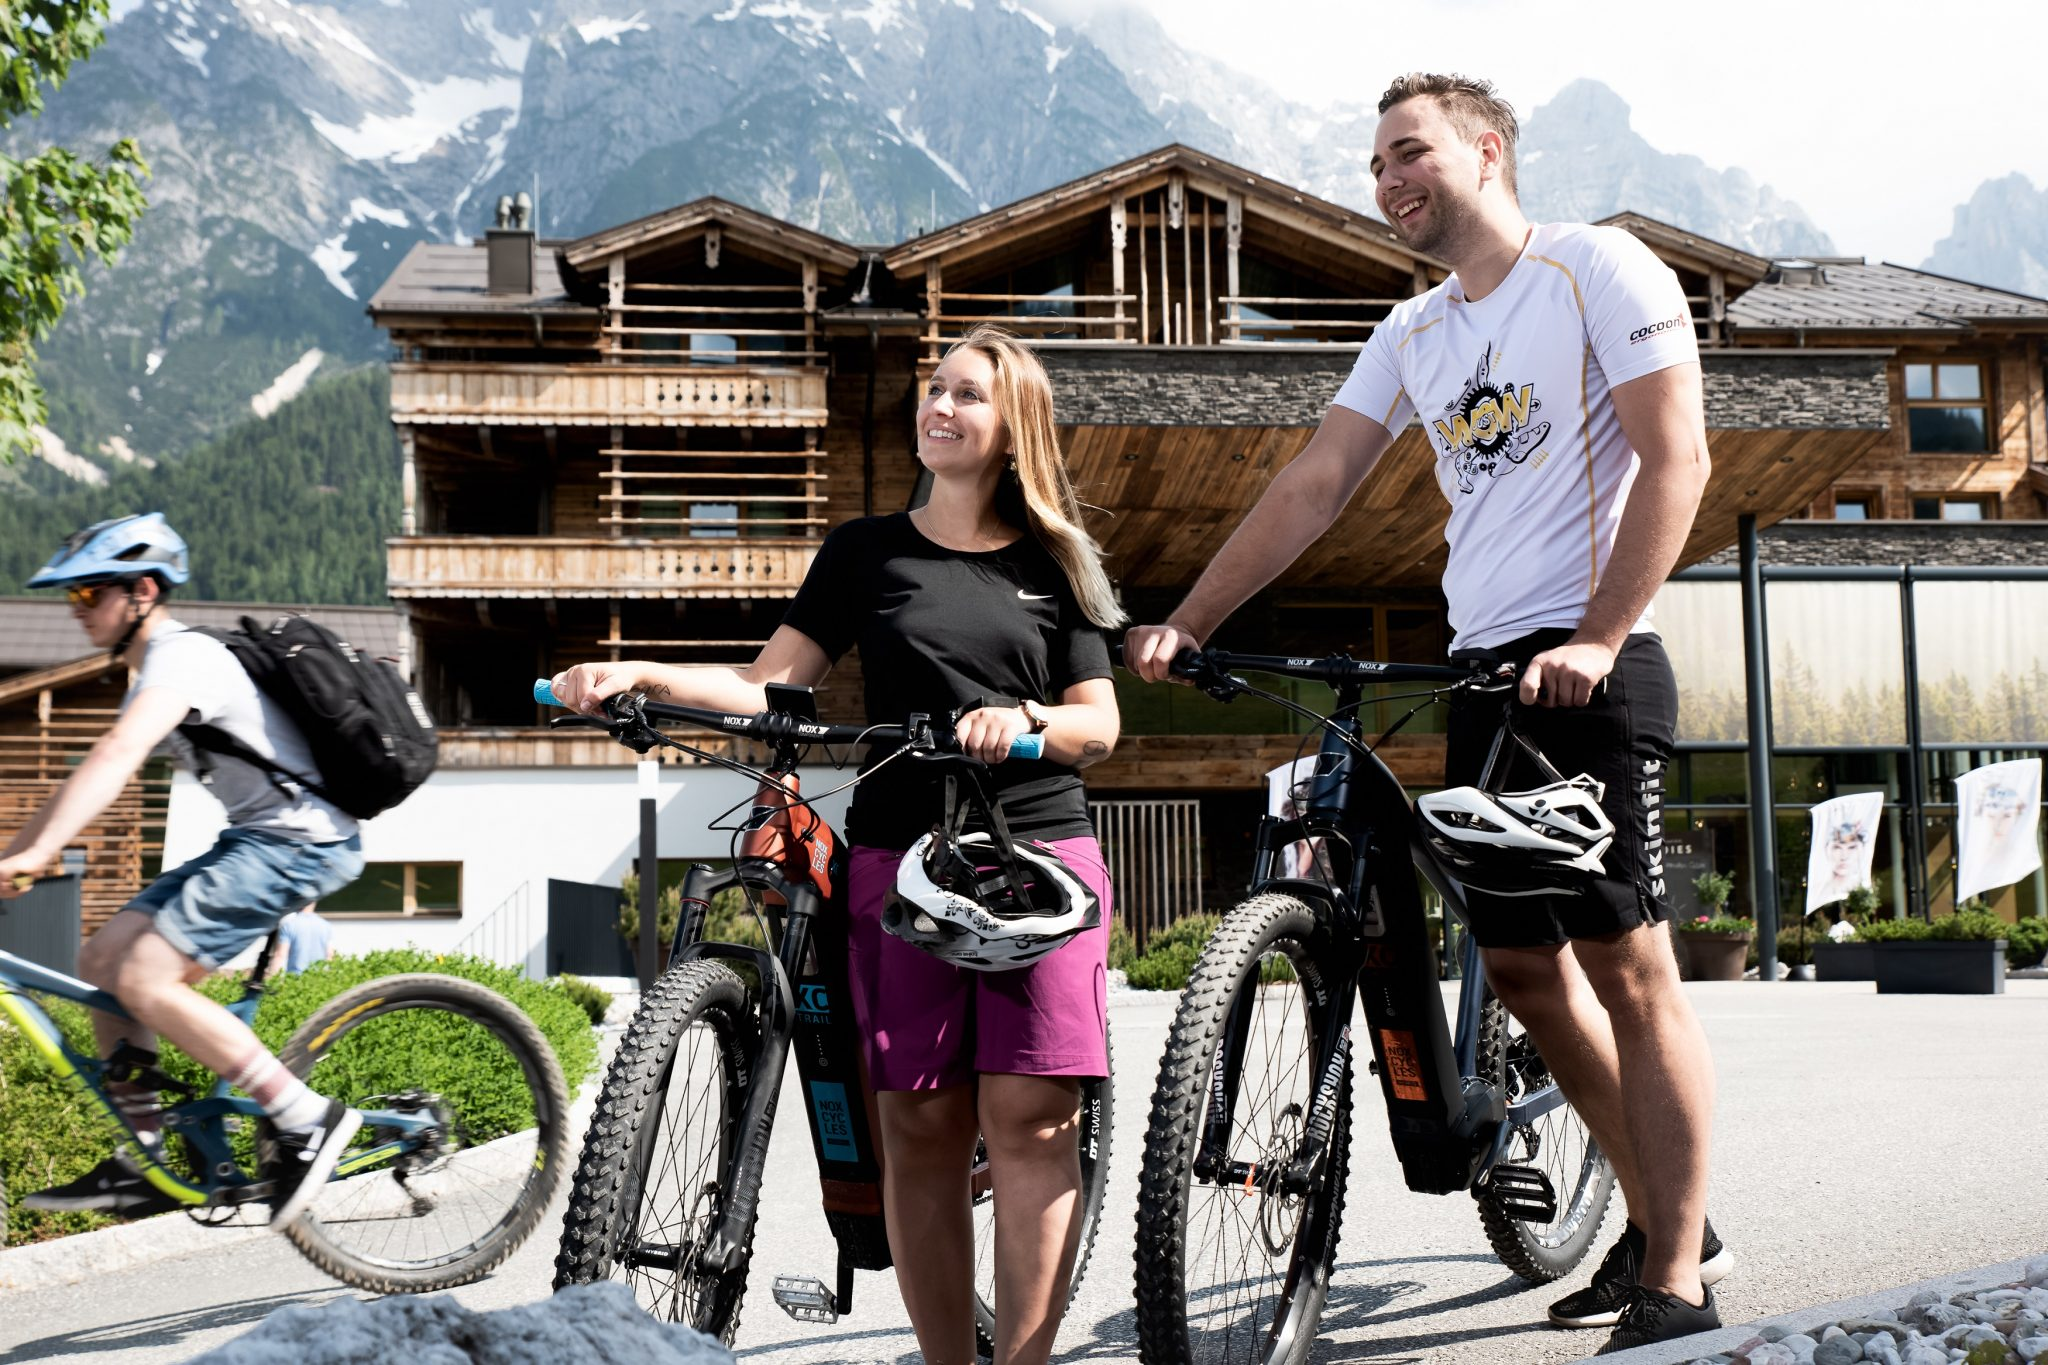 bikeparadies_in_leogang_c_peter_kuehnl_puradies_-_mein_naturresort